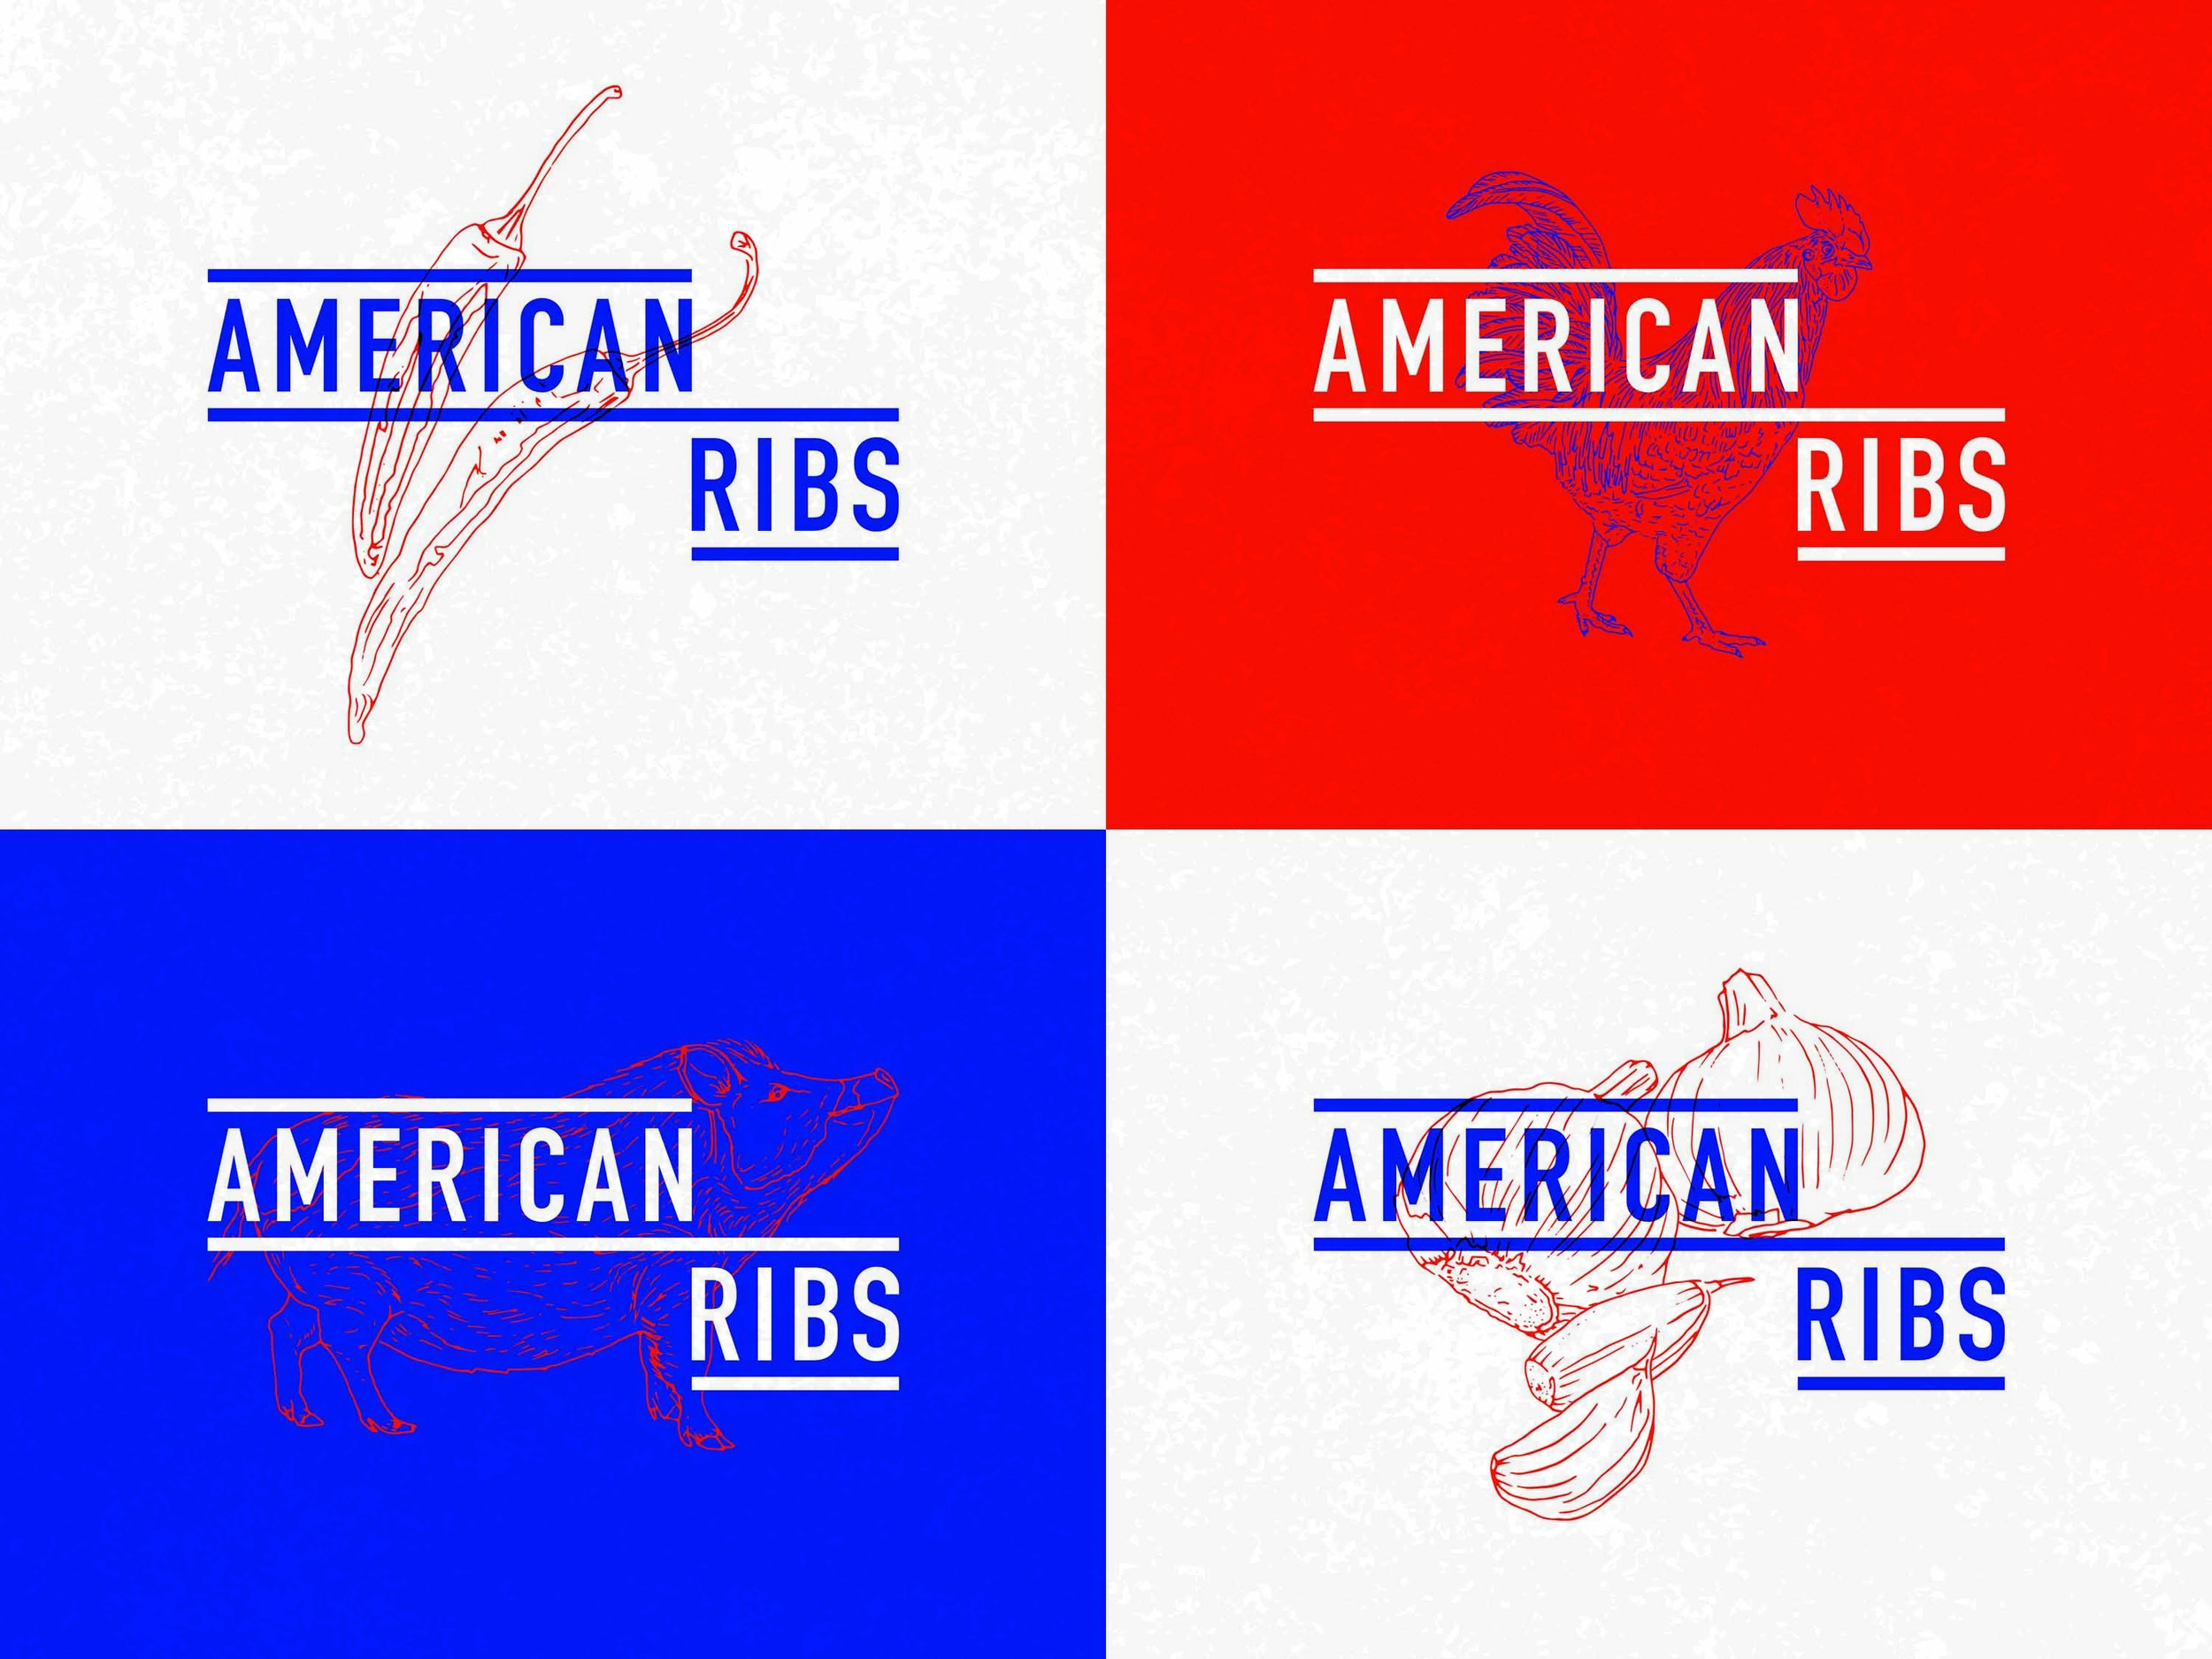 mode-design-american-ribs_08.jpg